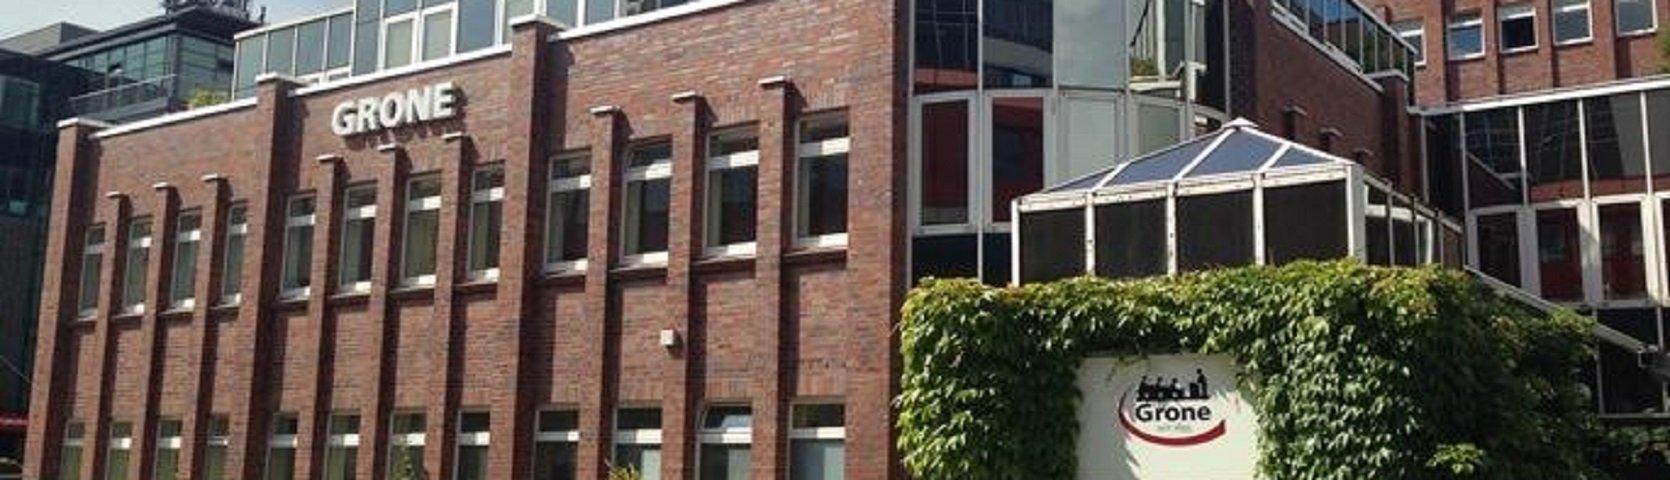 Grone Wirtschaftsakademie Hamburg